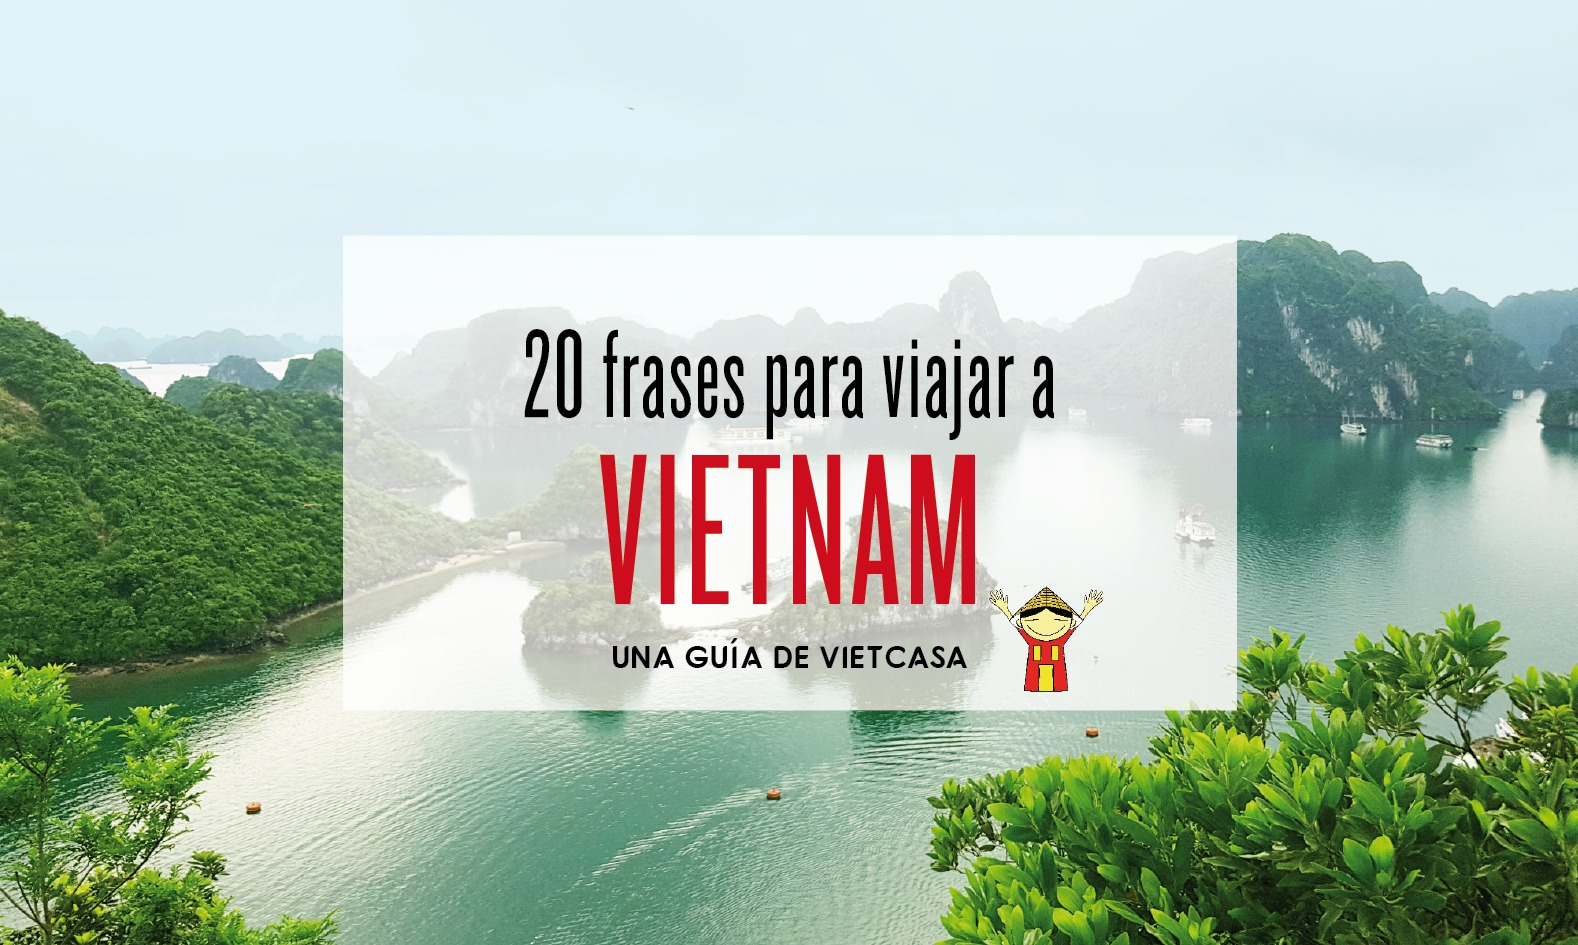 20 frases para viajar a Vietnam